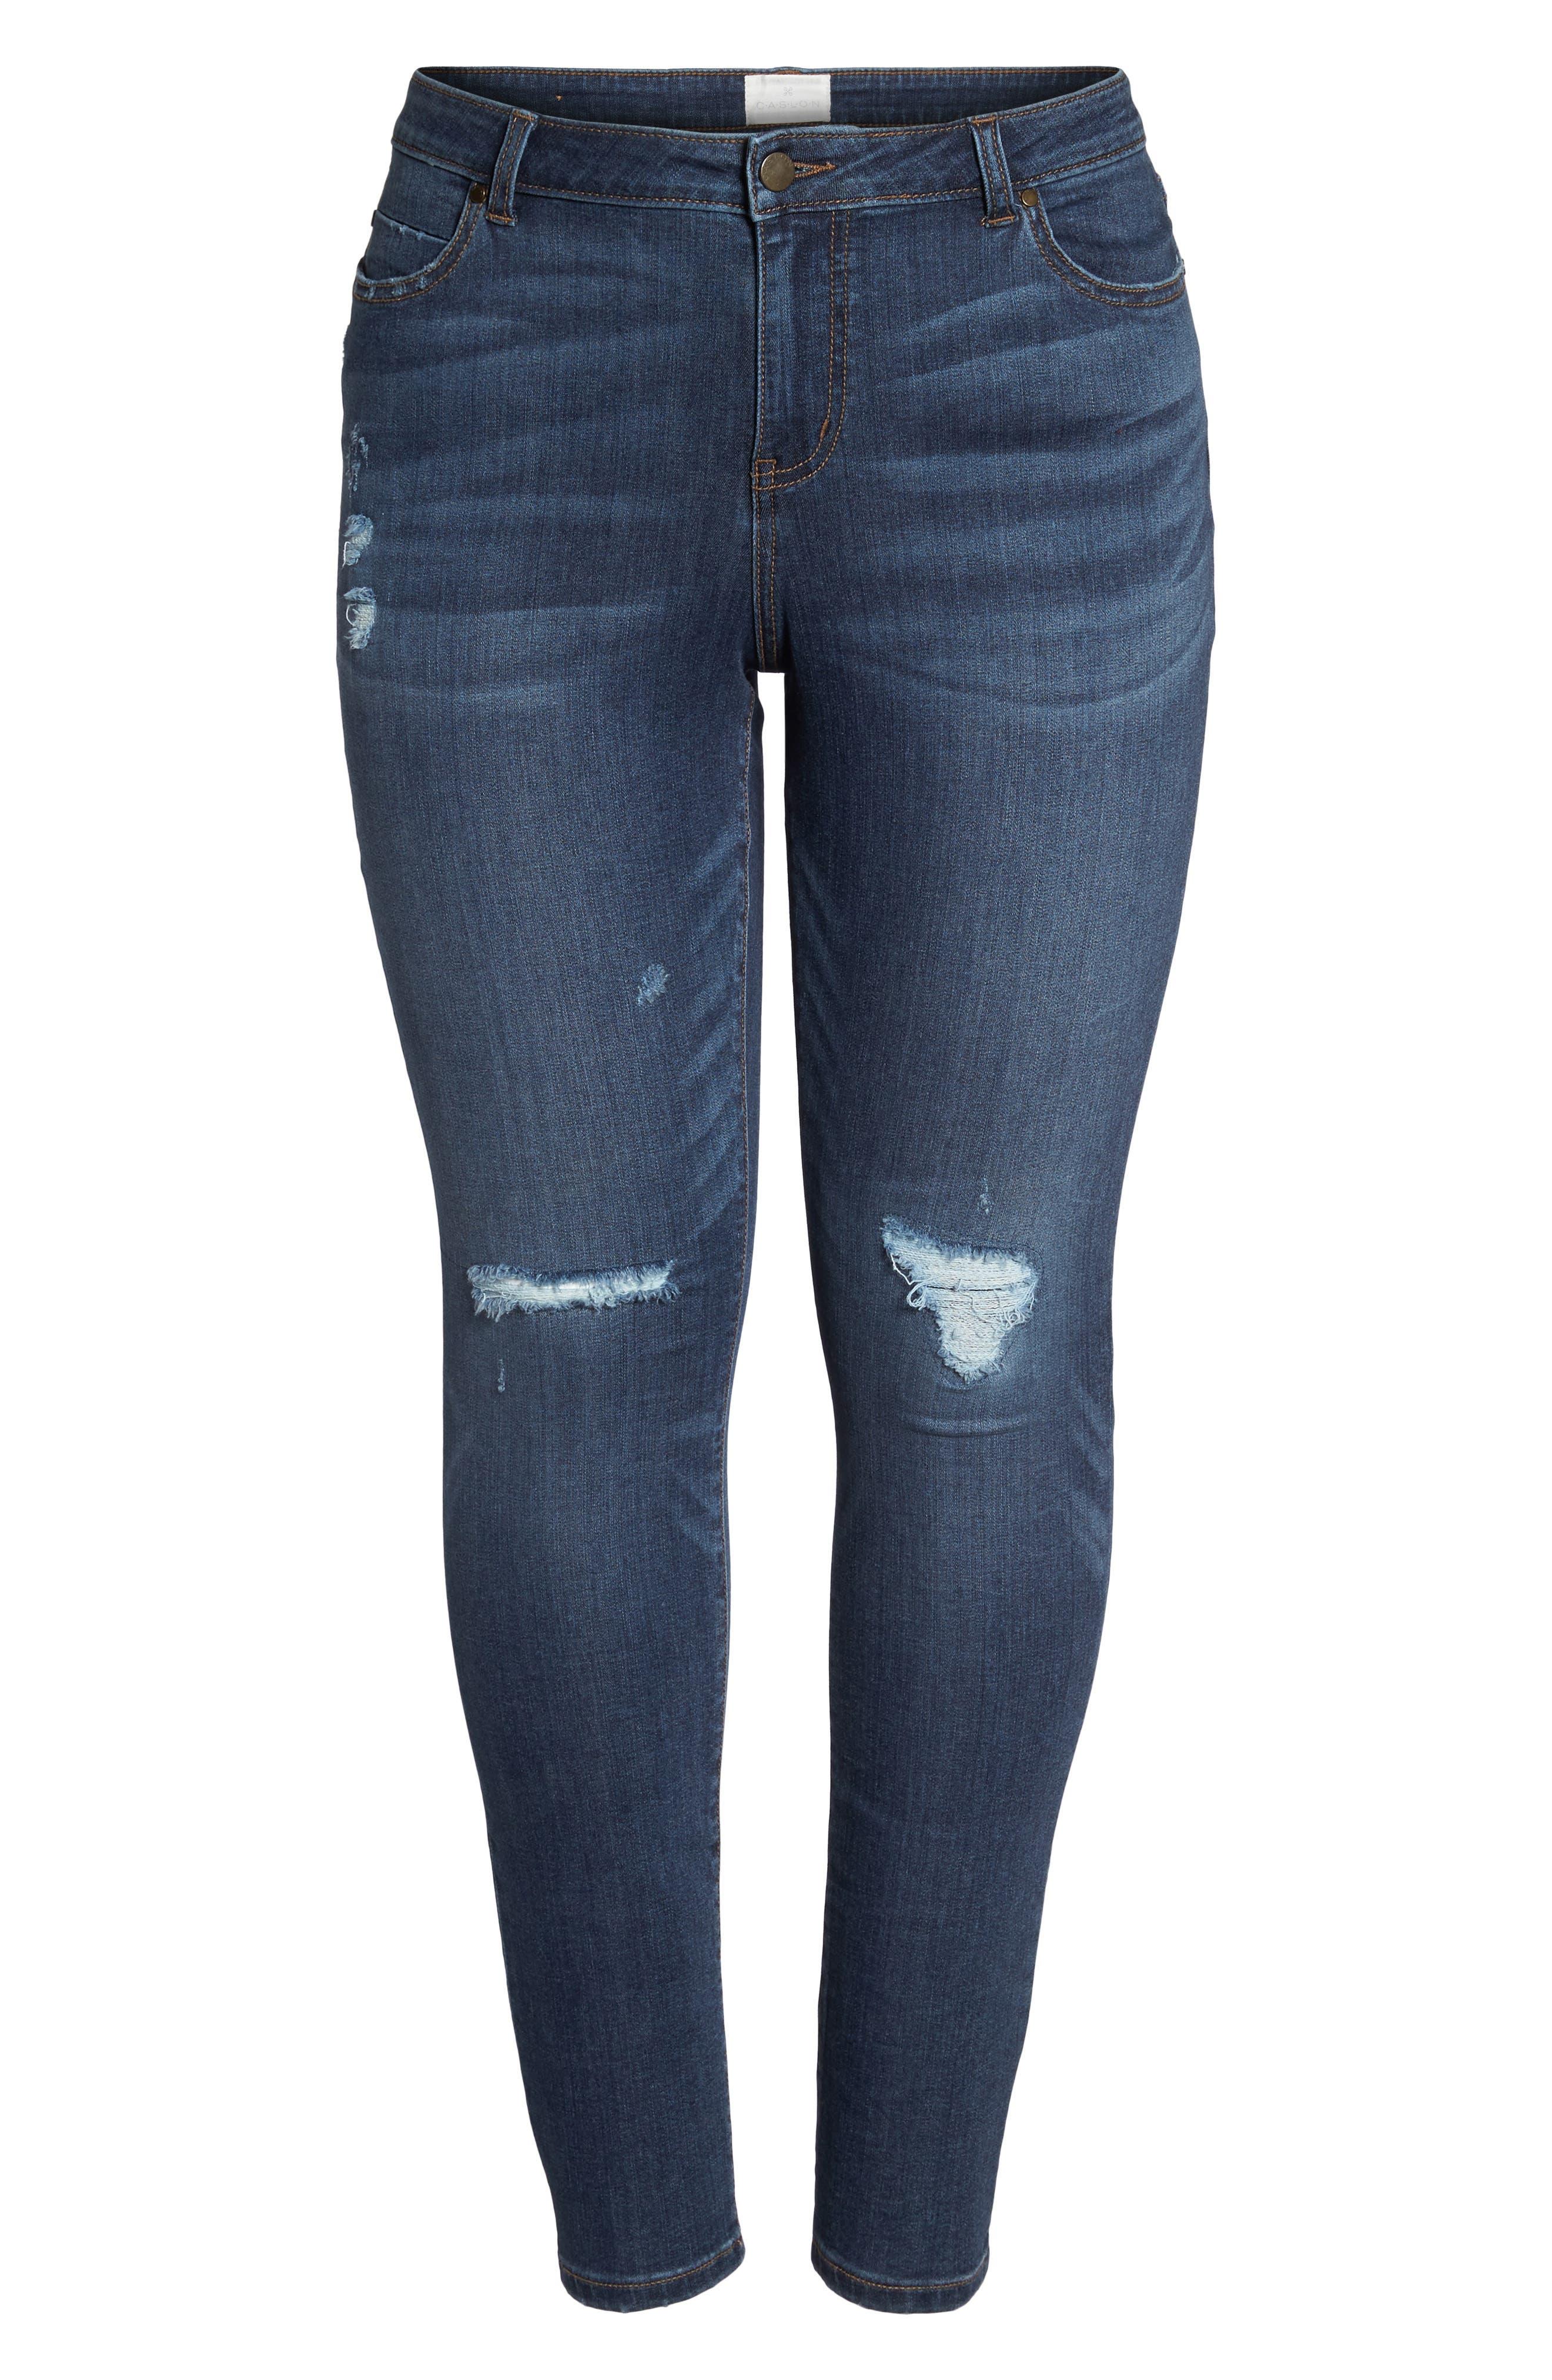 Rip Repair Skinny Jeans,                             Alternate thumbnail 7, color,                             Blue Octavia Wash